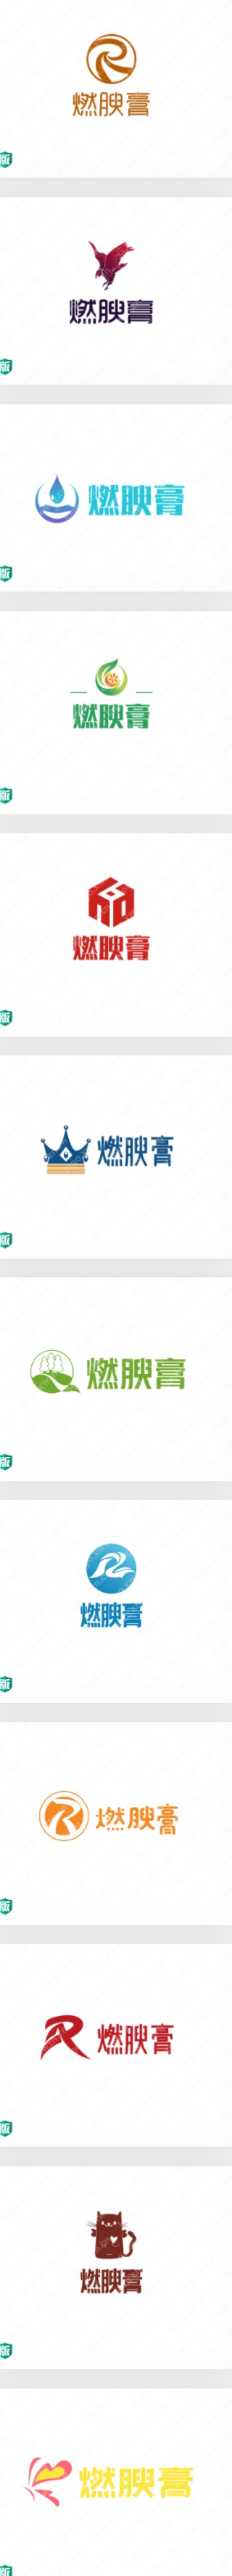 "LOGO设计欣赏:减肥行业""燃腴膏""设计大集合"